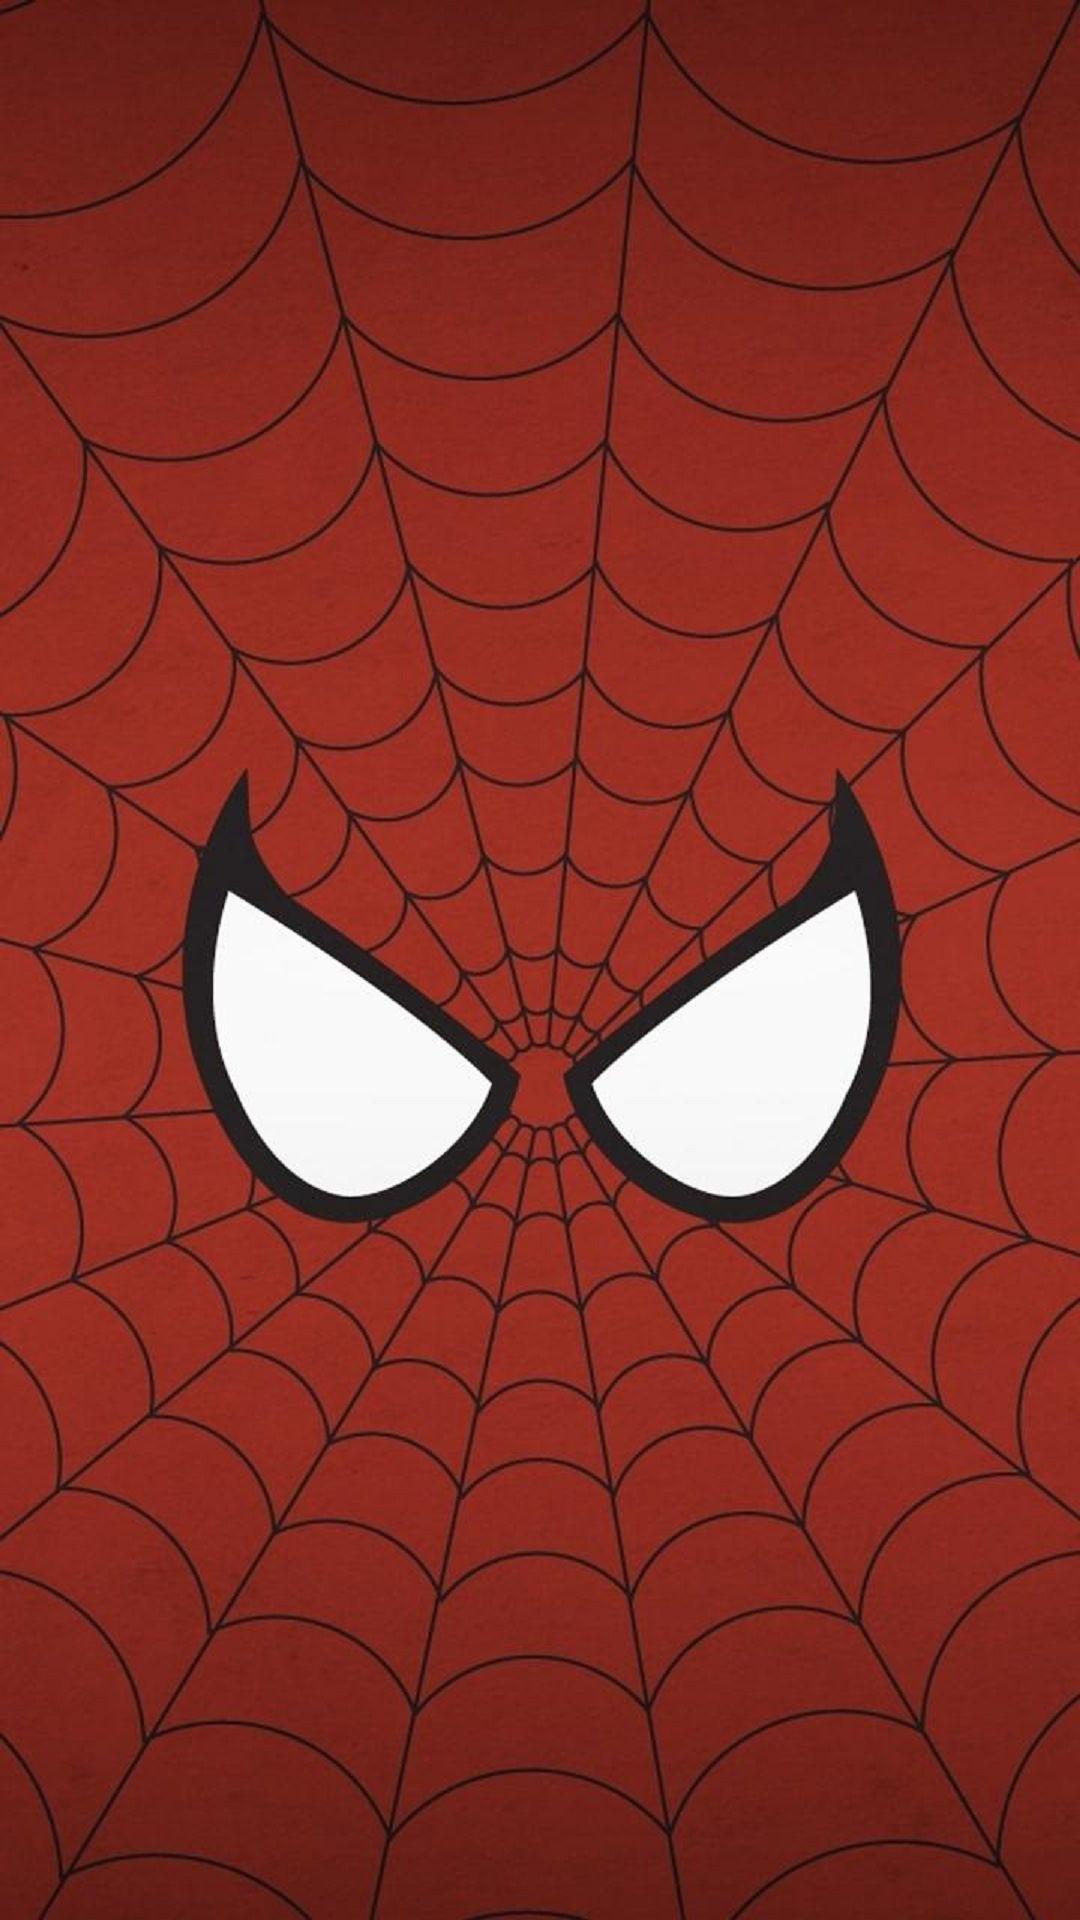 spiderman eyes illustration lg android wallpaper free download